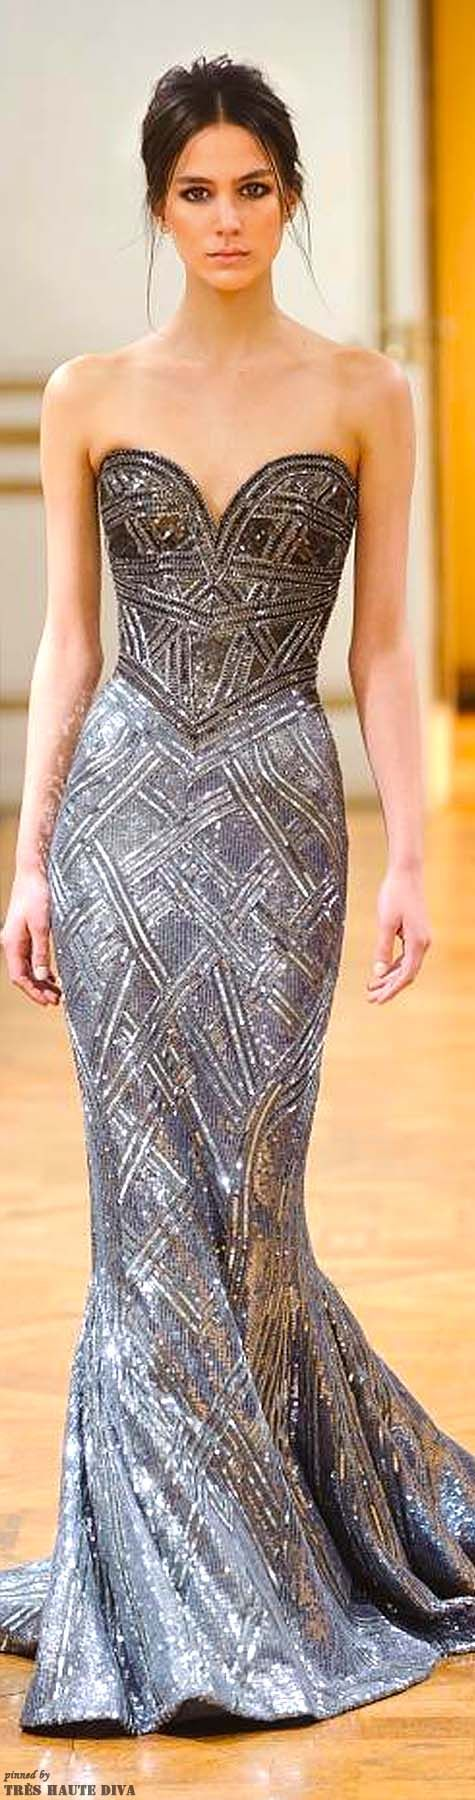 Zuhair Murad HC Autumn 2013 (The Gown Boutique), sexy evening gown